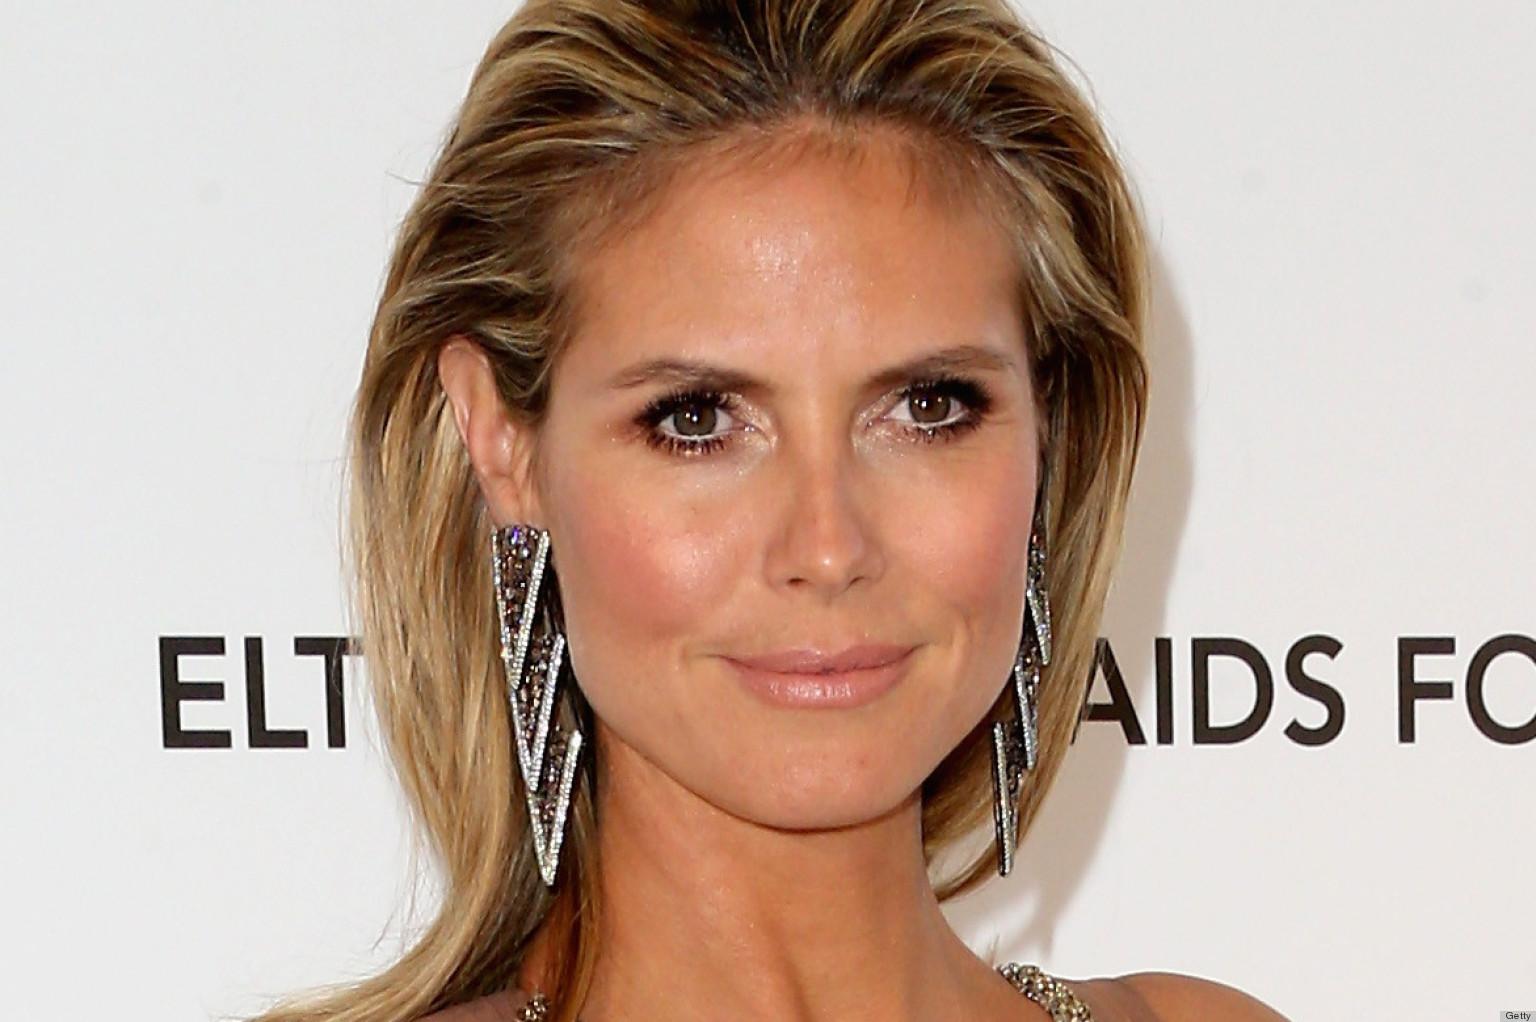 Heidi Klum: Heidi Klum Without Makeup Is As Gorgeous As You'd Expect